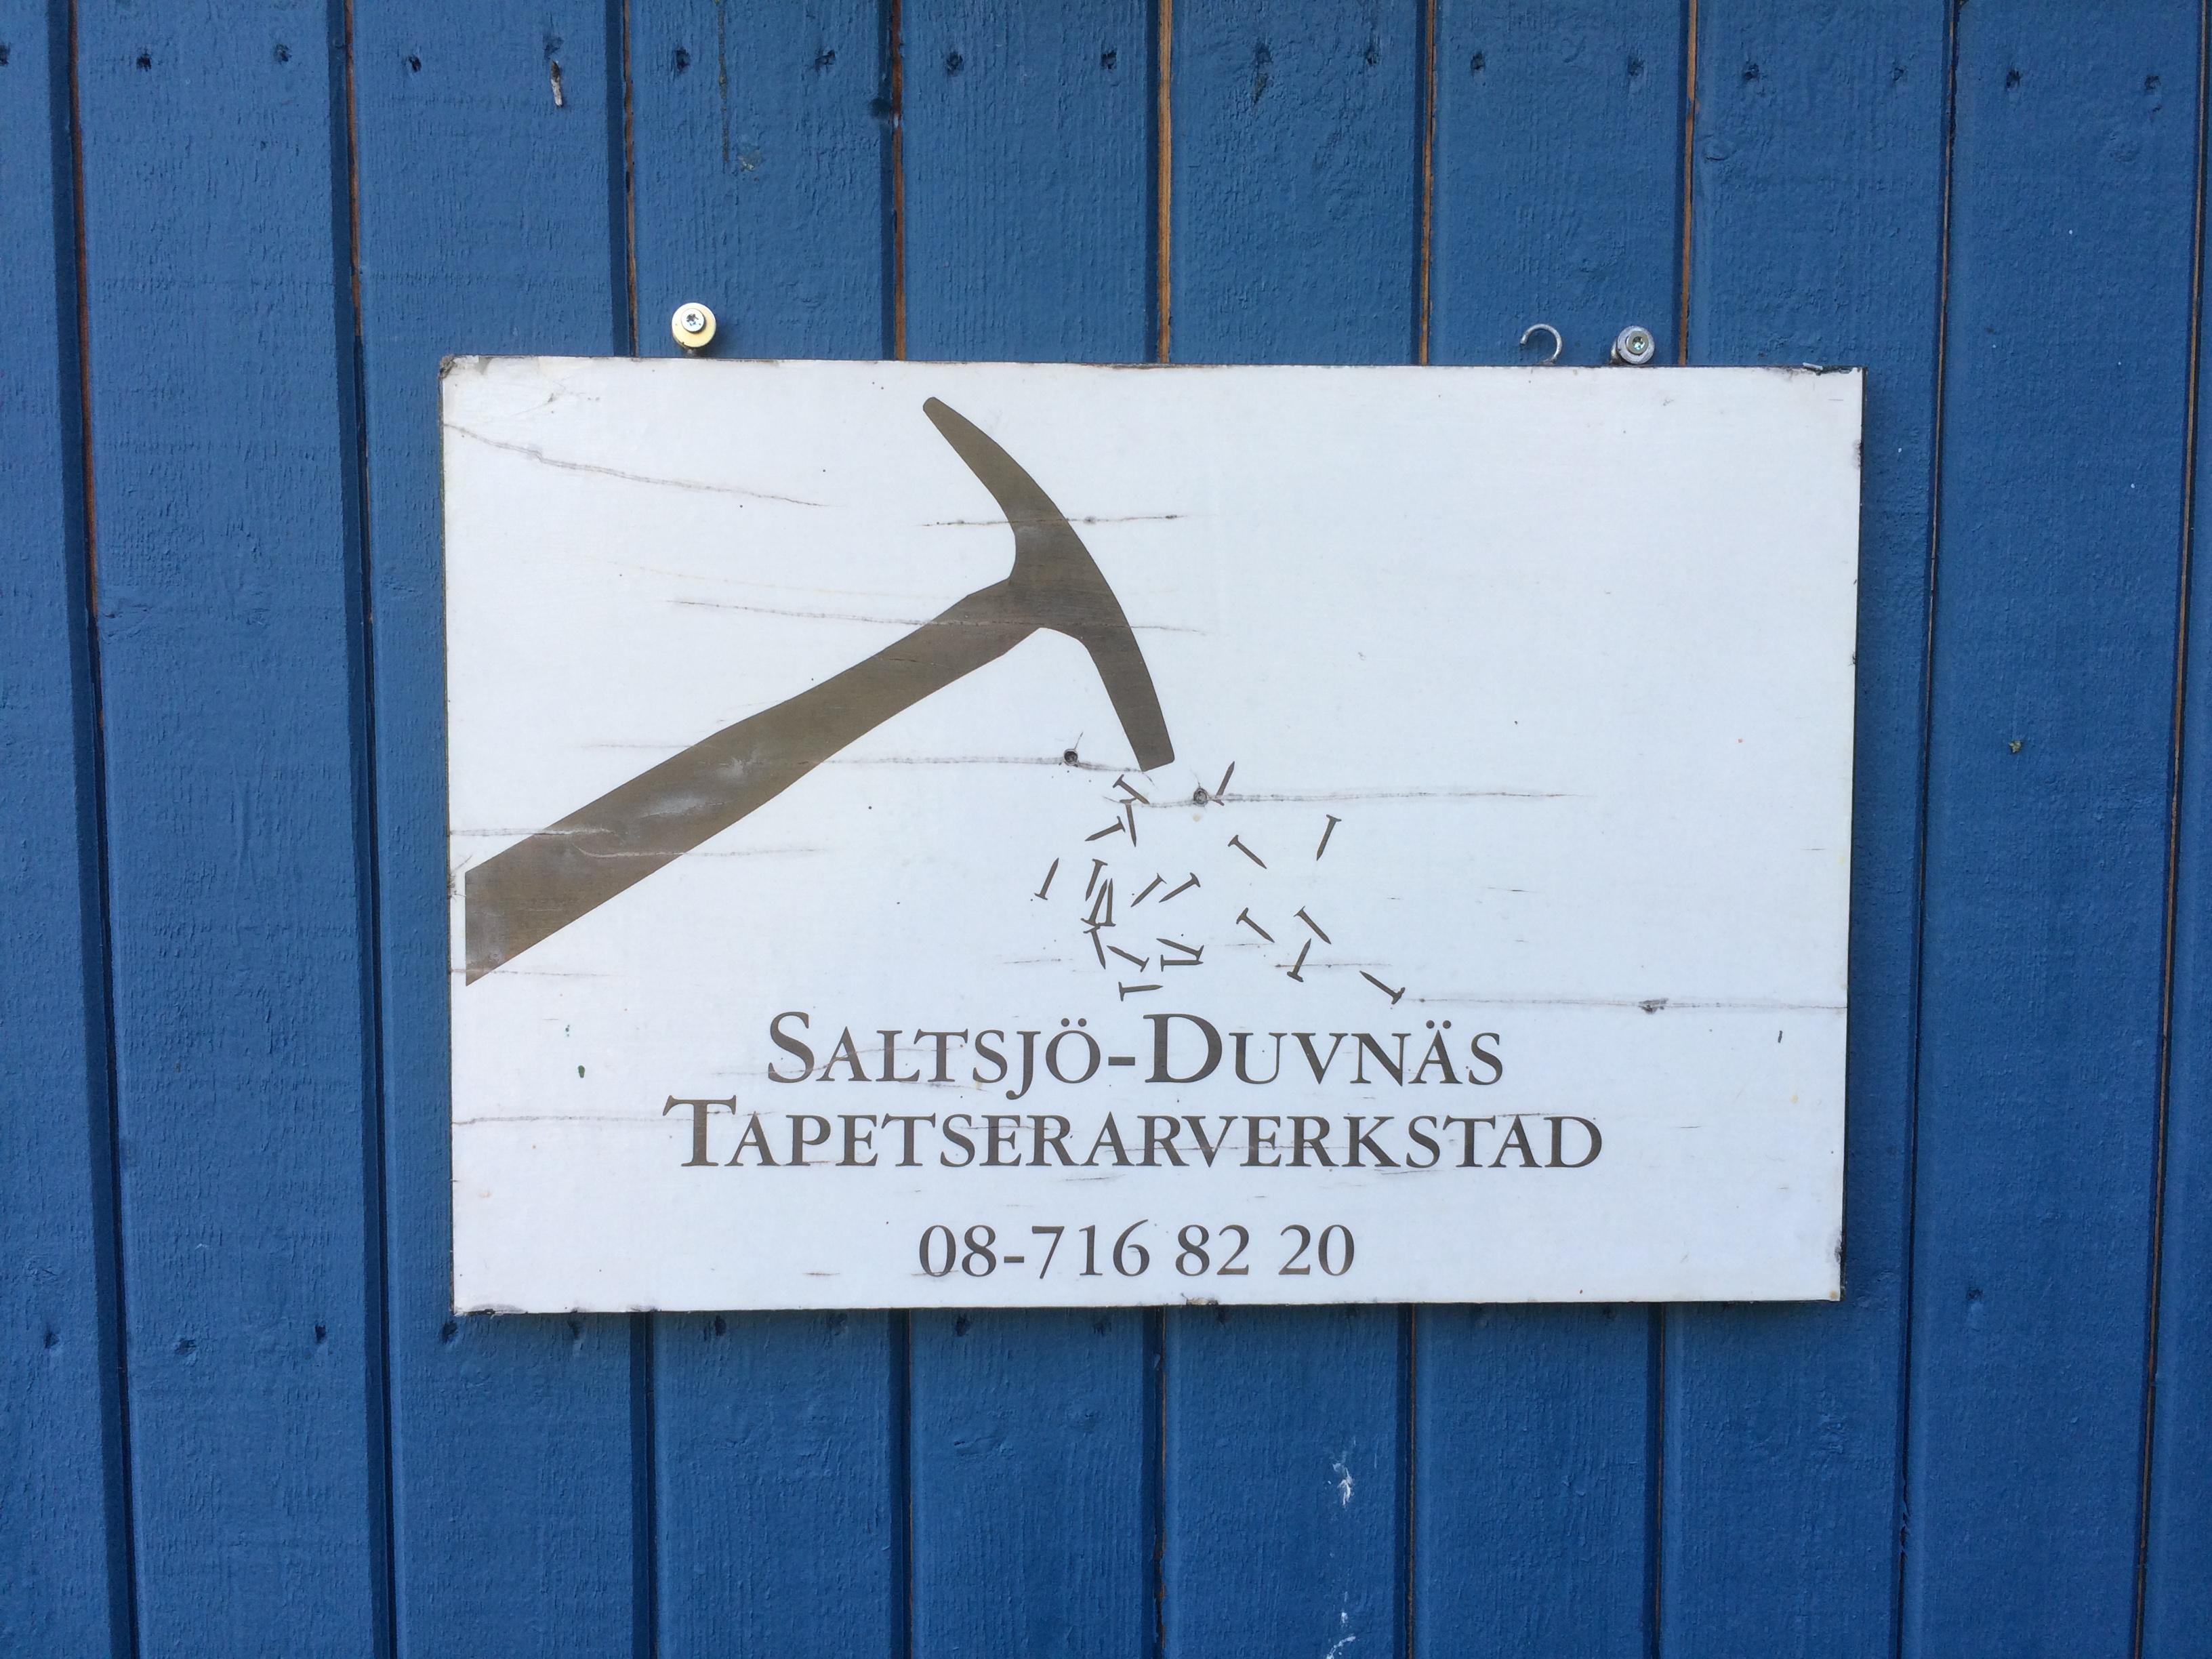 Saltsjö-Duvnäs Tapetserarverkstad - Din Tapetserare i Nacka